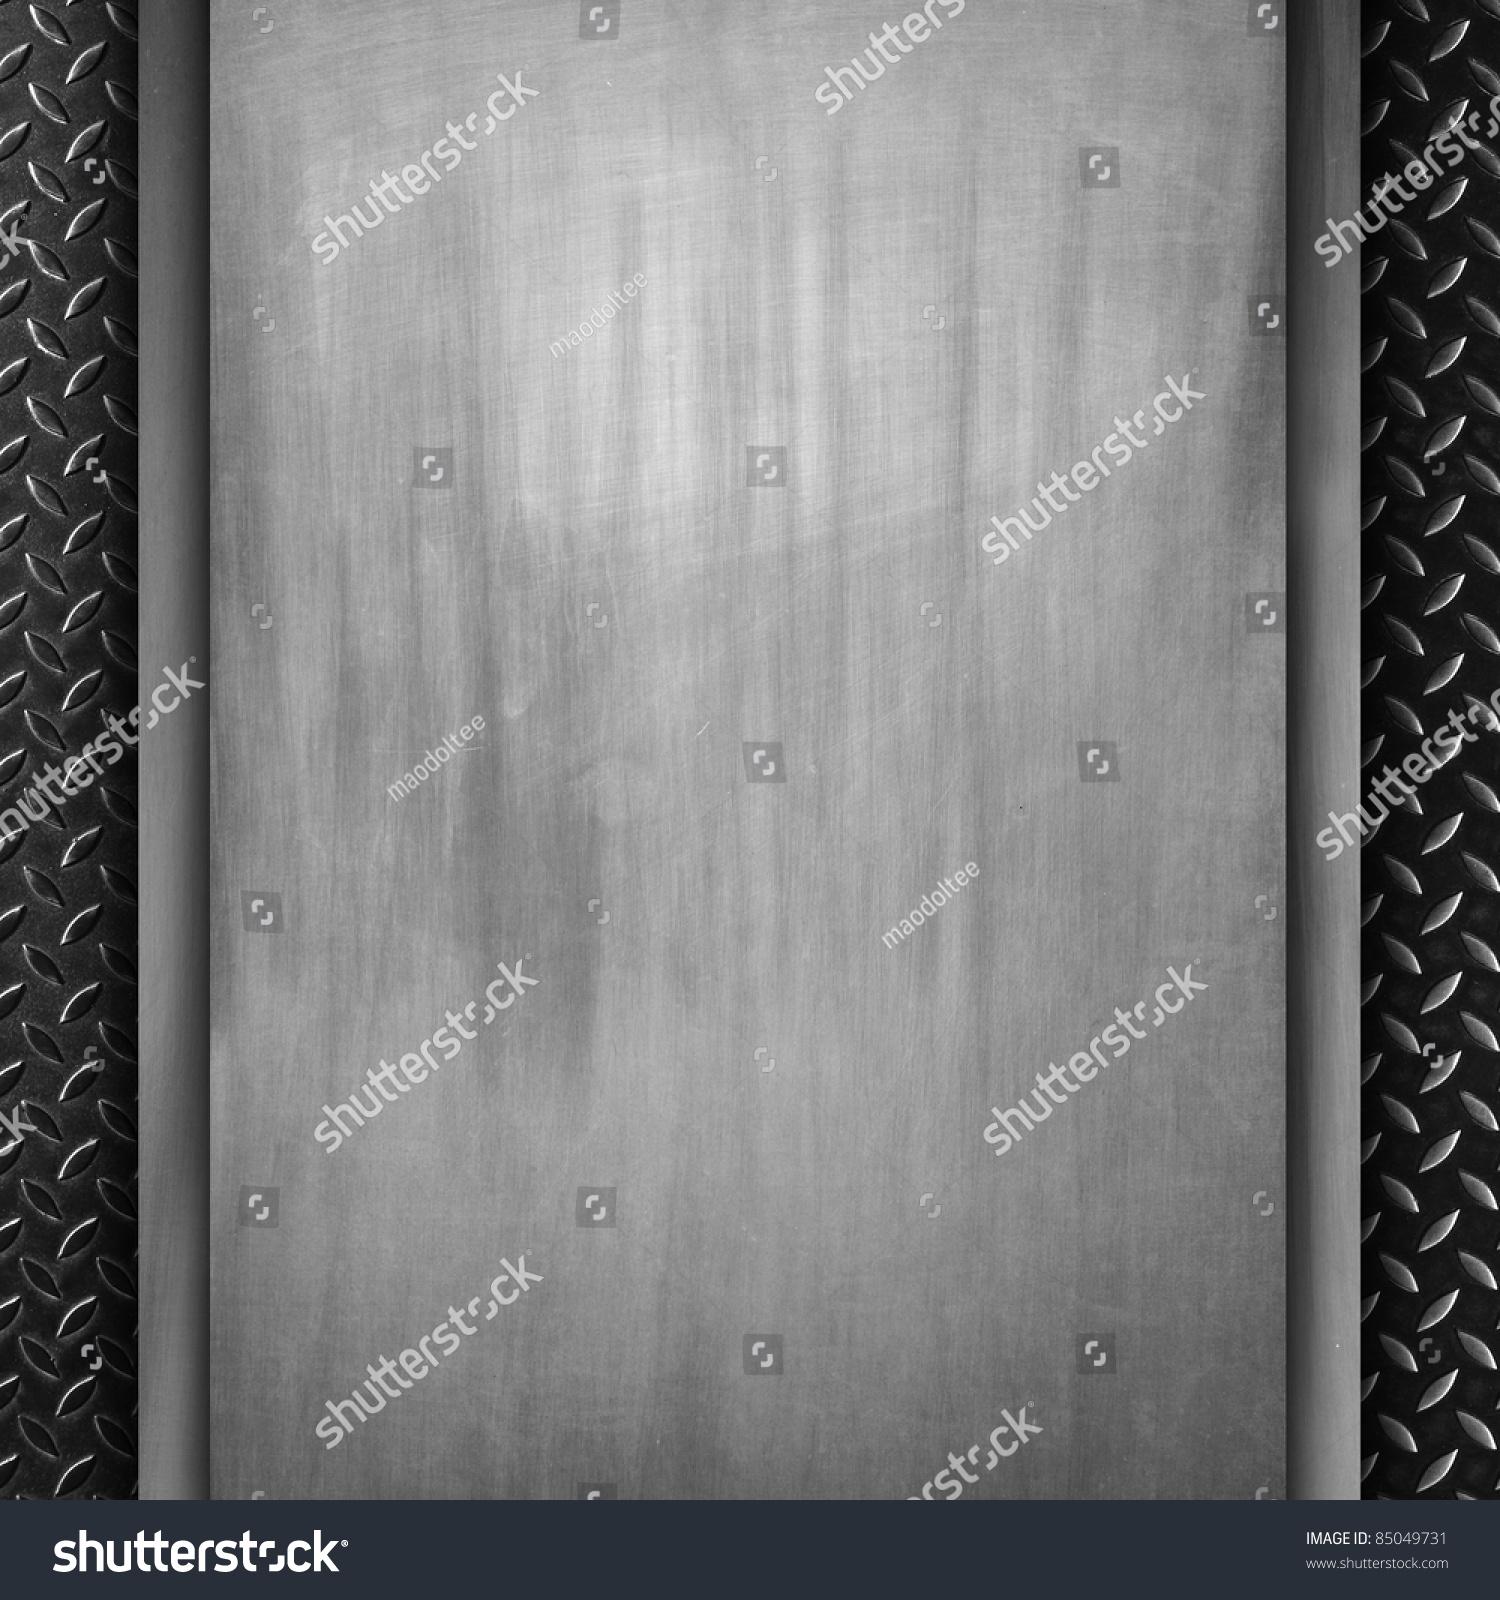 Blank Scratch Metal Sheet On Old Metal Plate Stock Photo